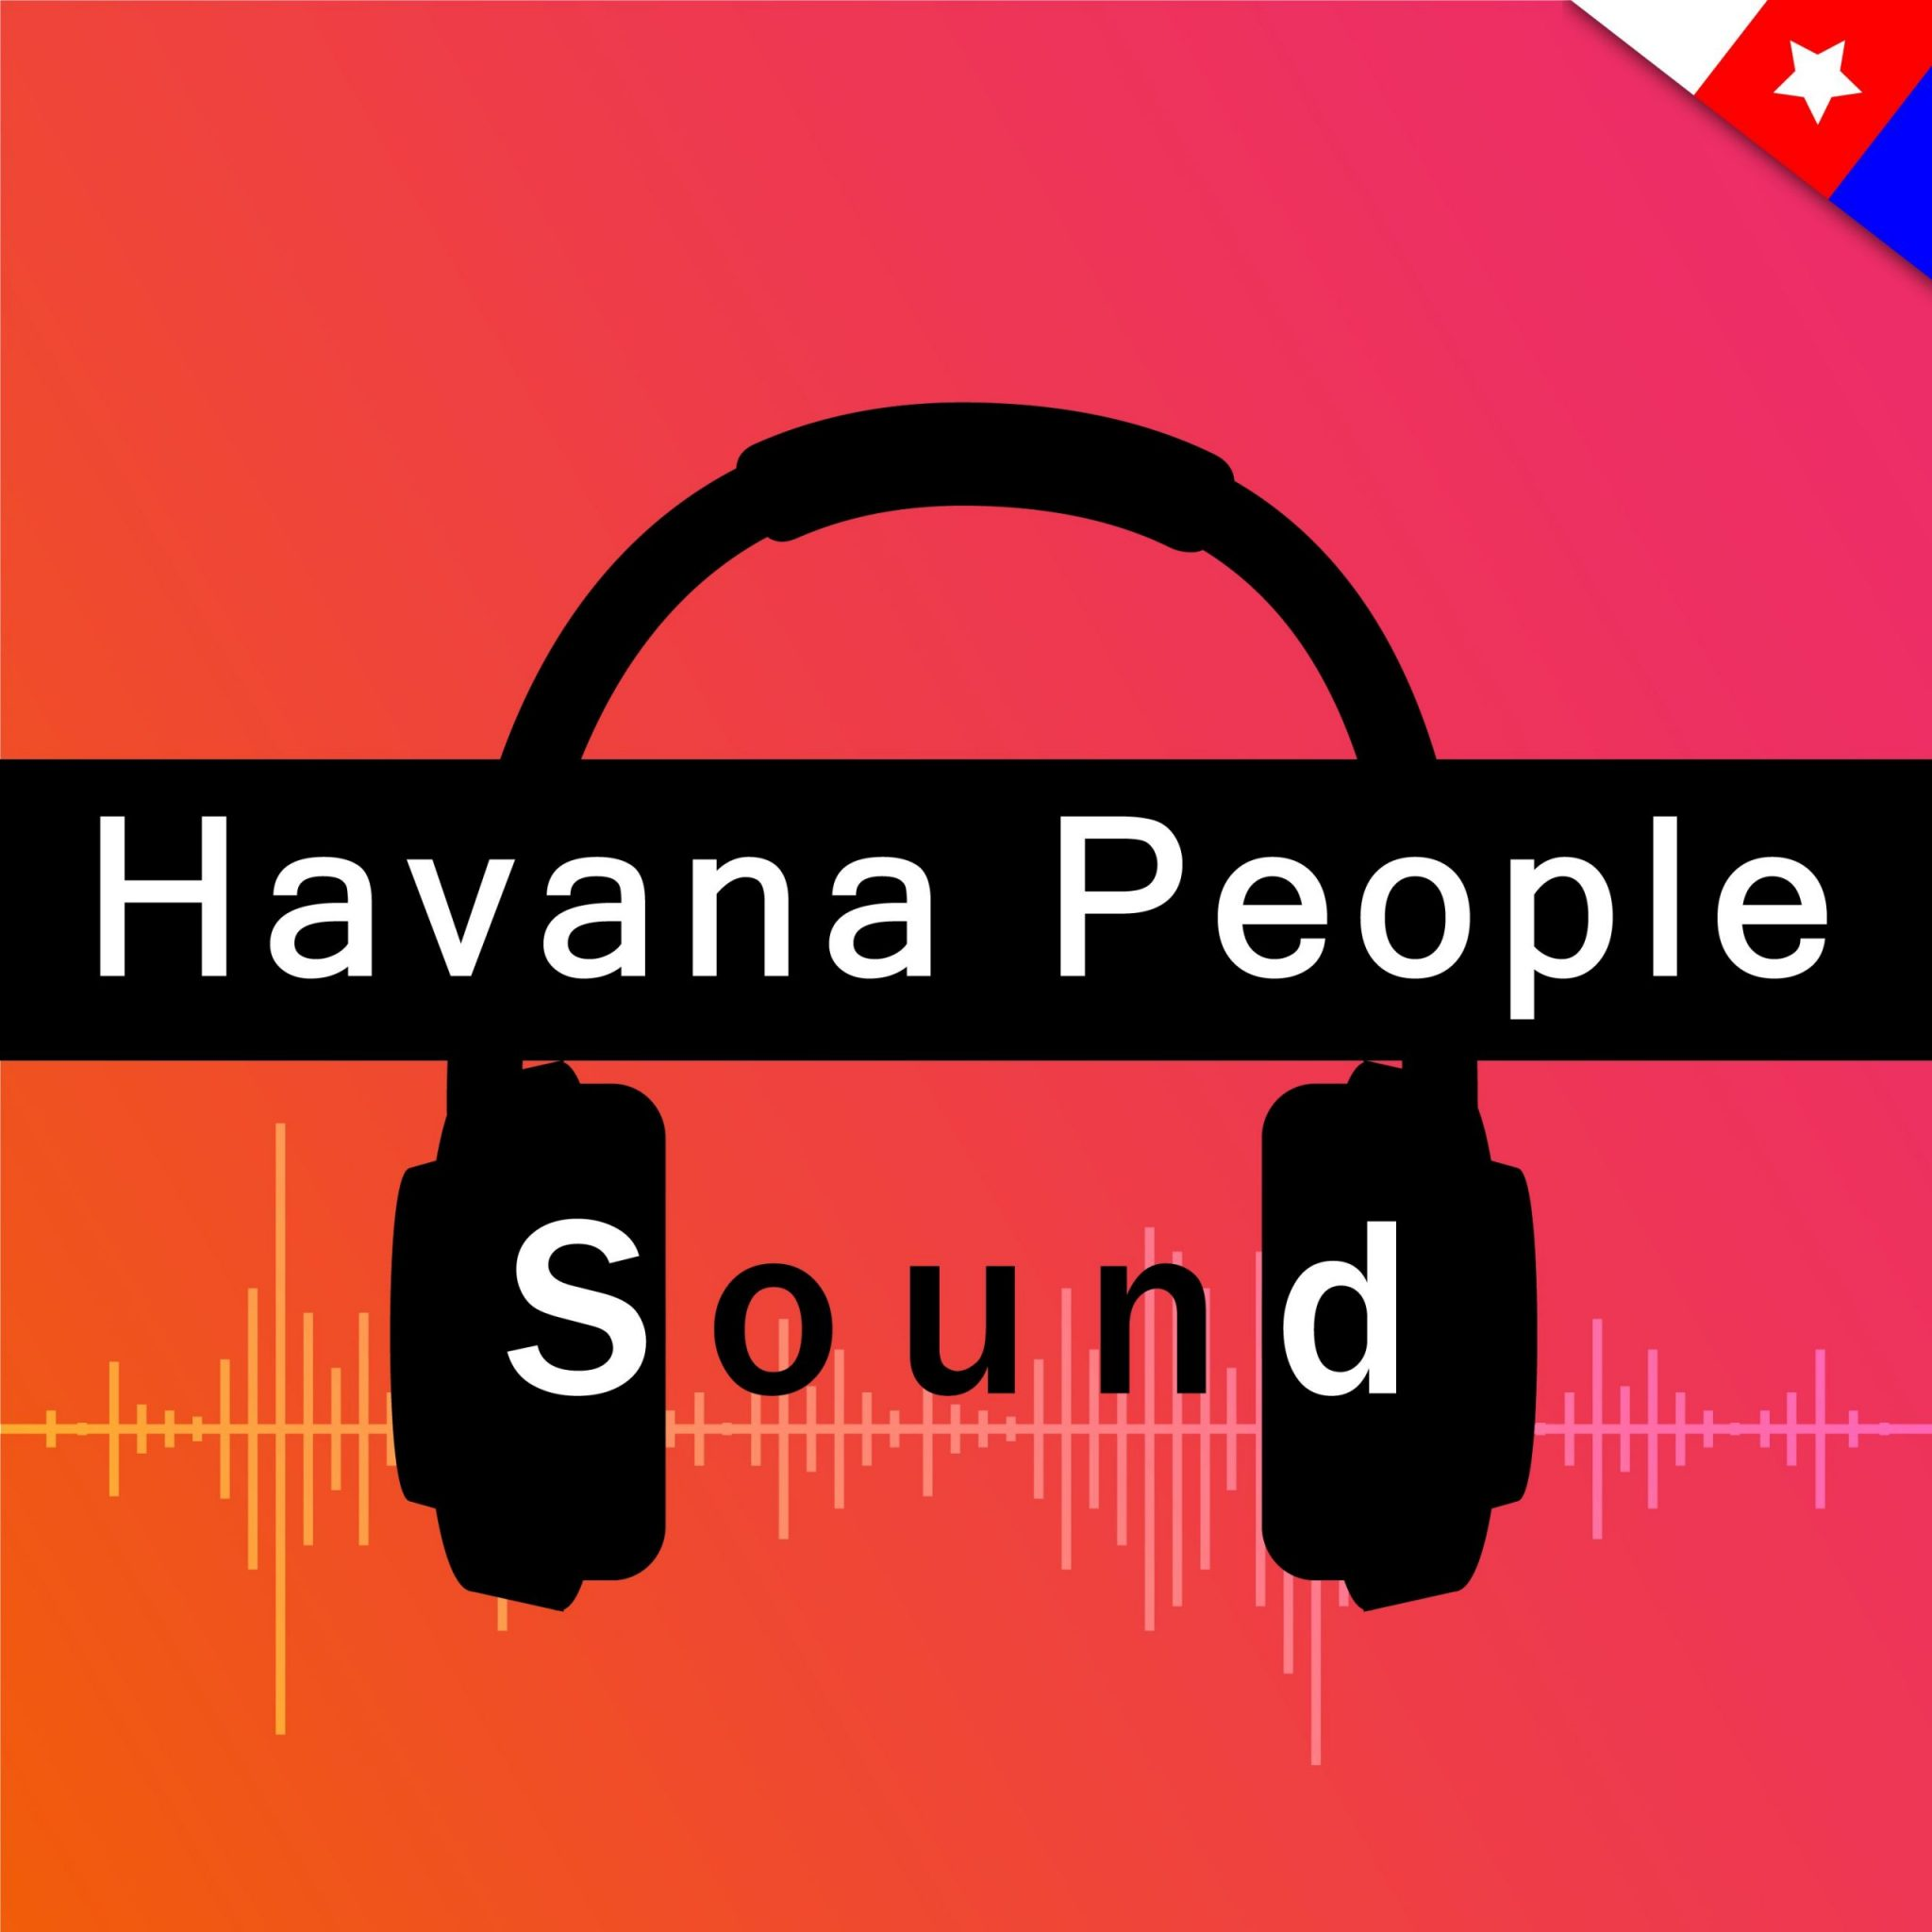 Havana People Sound - Podcast - Dance Community Dance Goals Social Media Choosing your level push your limits community support